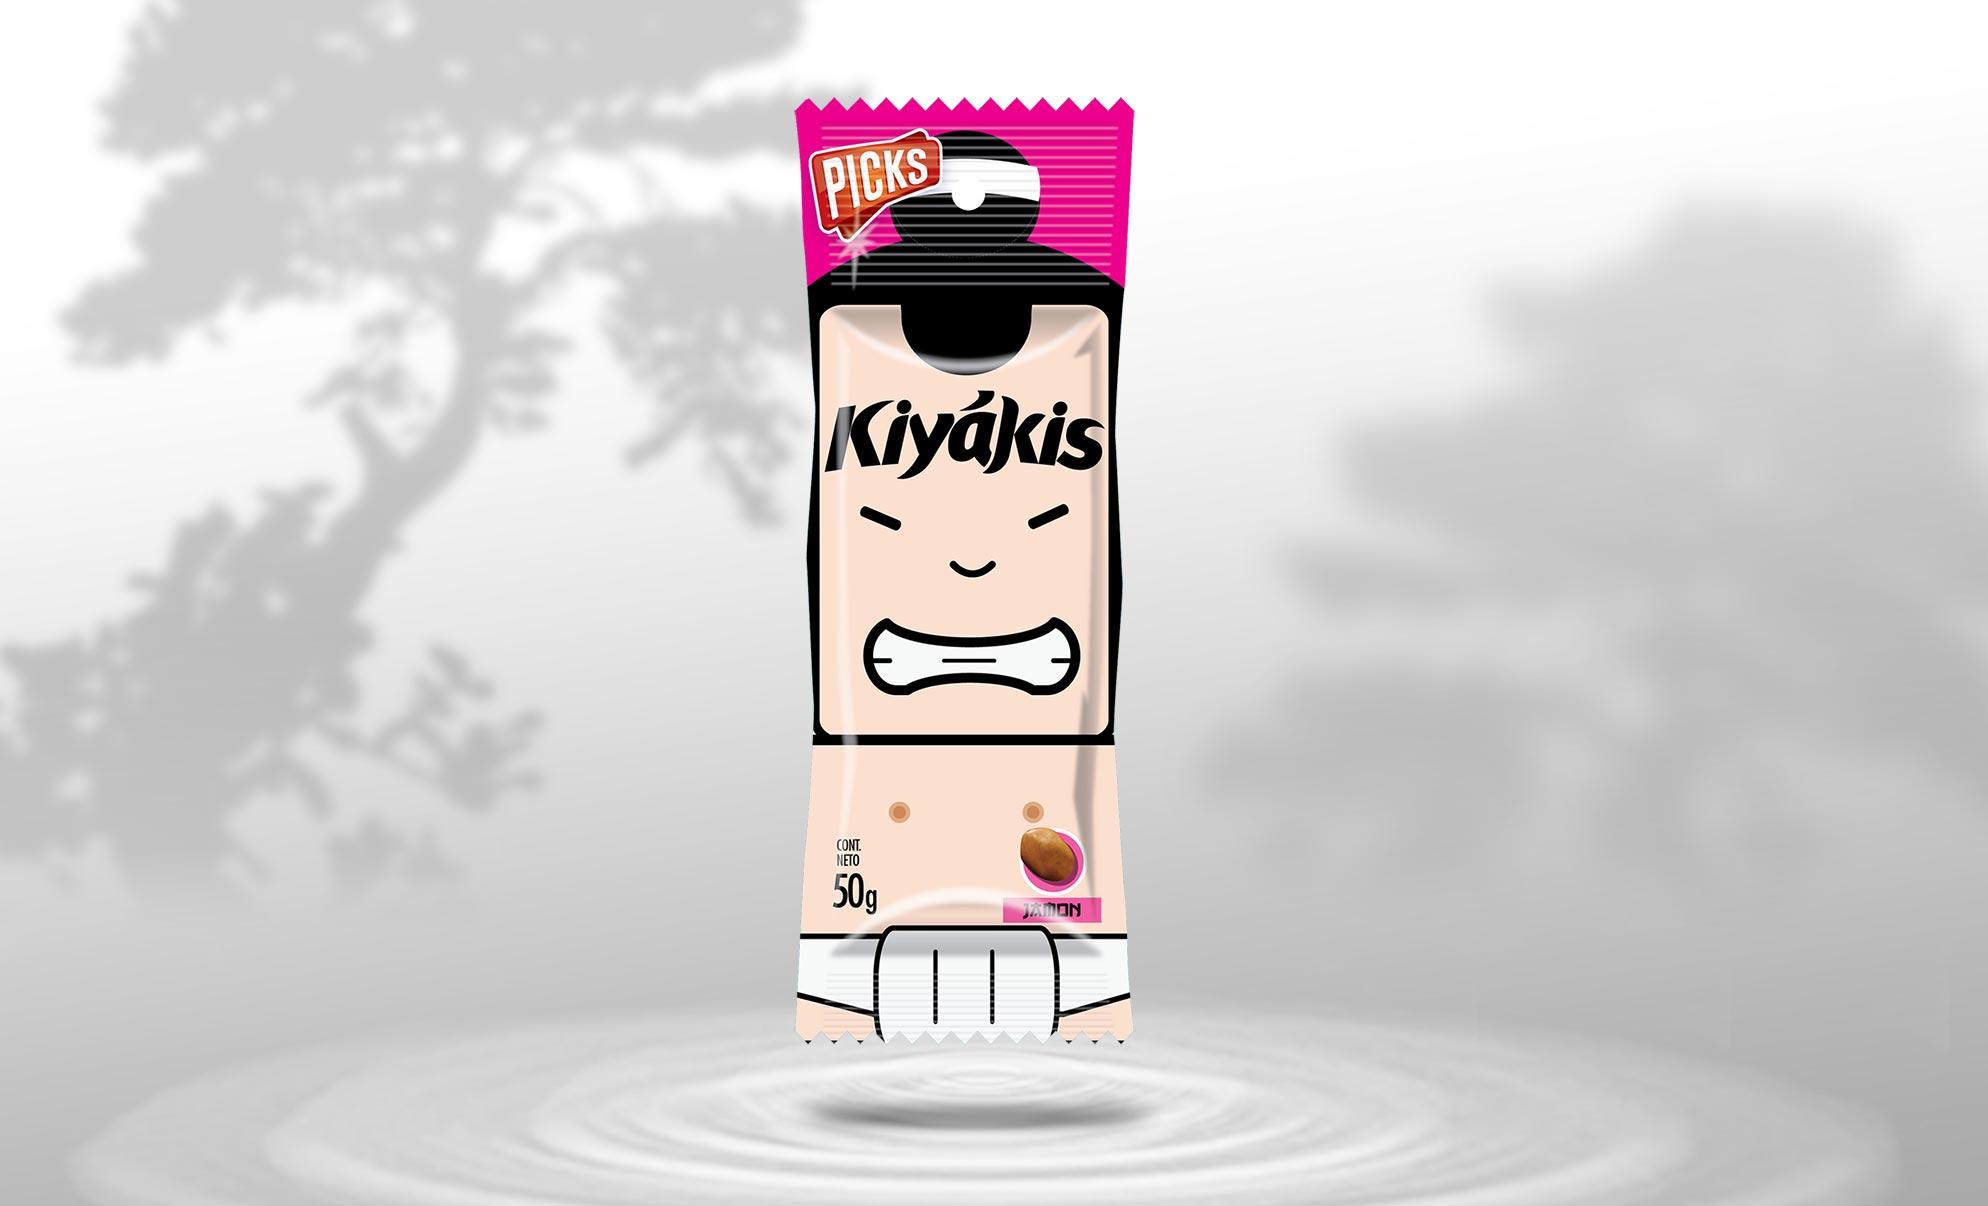 Kiyakis Peanuts Packaging Character Sumo Special Edition